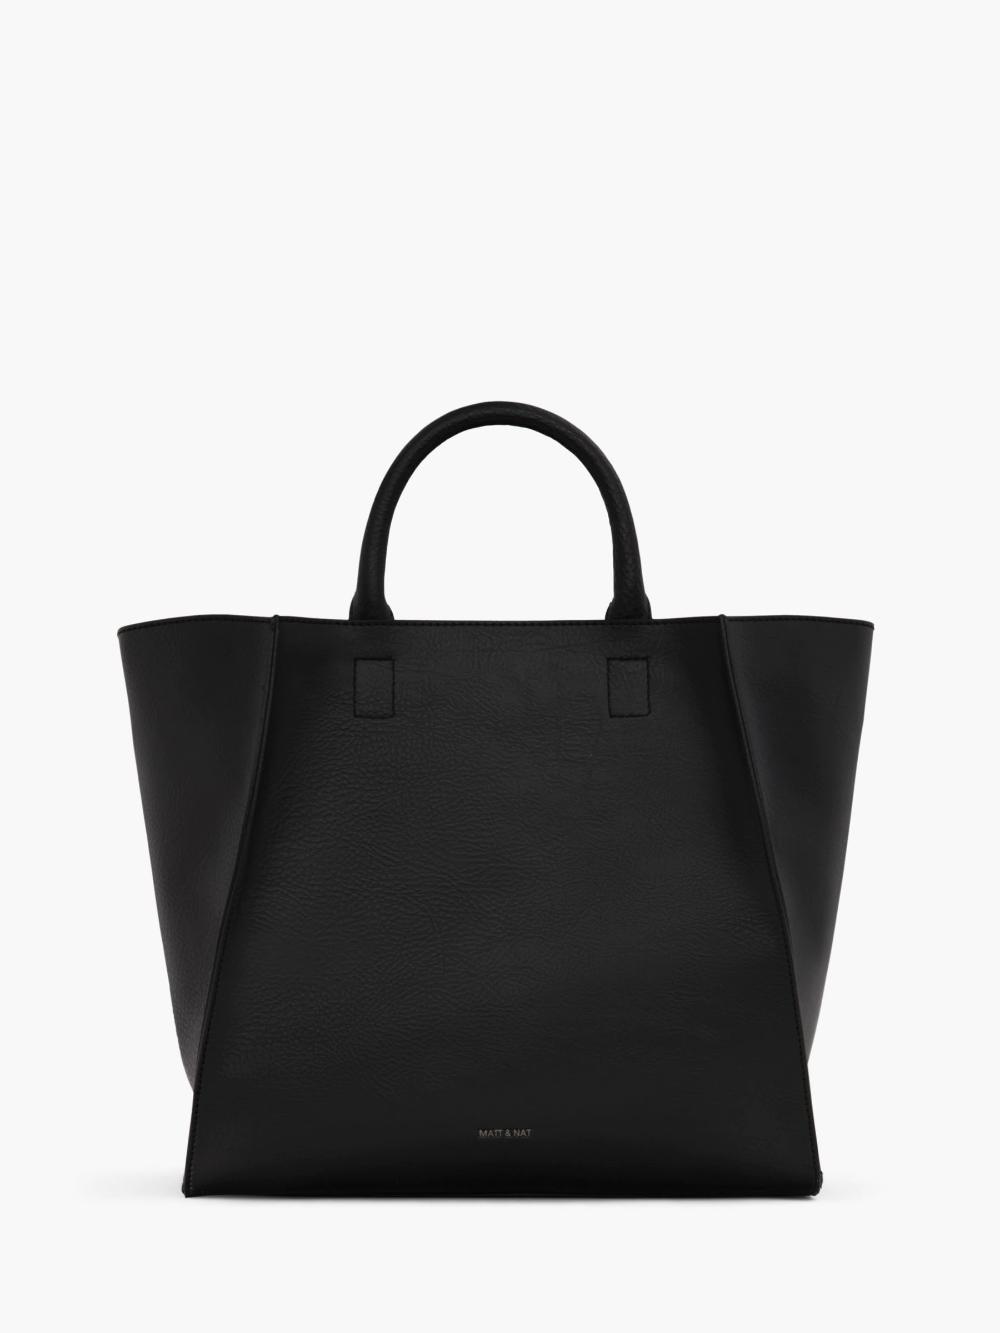 Matt & Nat Dwell Collection Loyal Vegan Tote Bag, Black at John Lewis & Partners